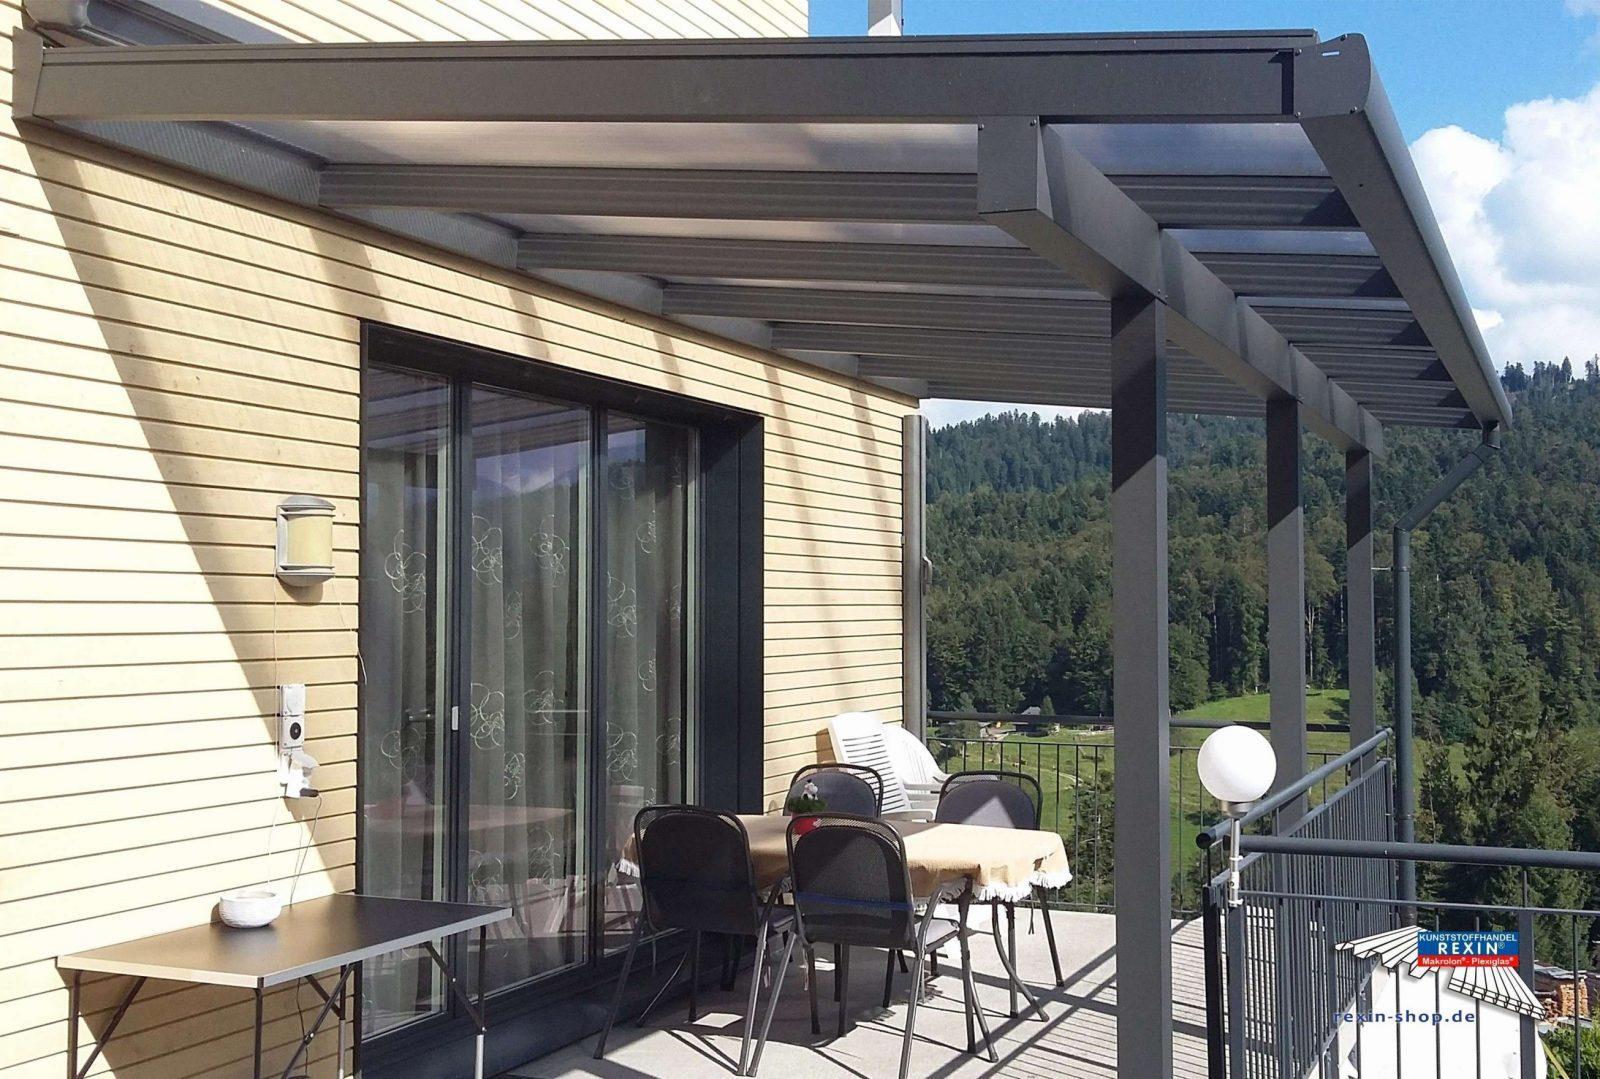 Pergola Selber Bauen Terrasse Schön Sichtschutzzaun Terrasse Beste von Pergola Selber Bauen Terrasse Bild